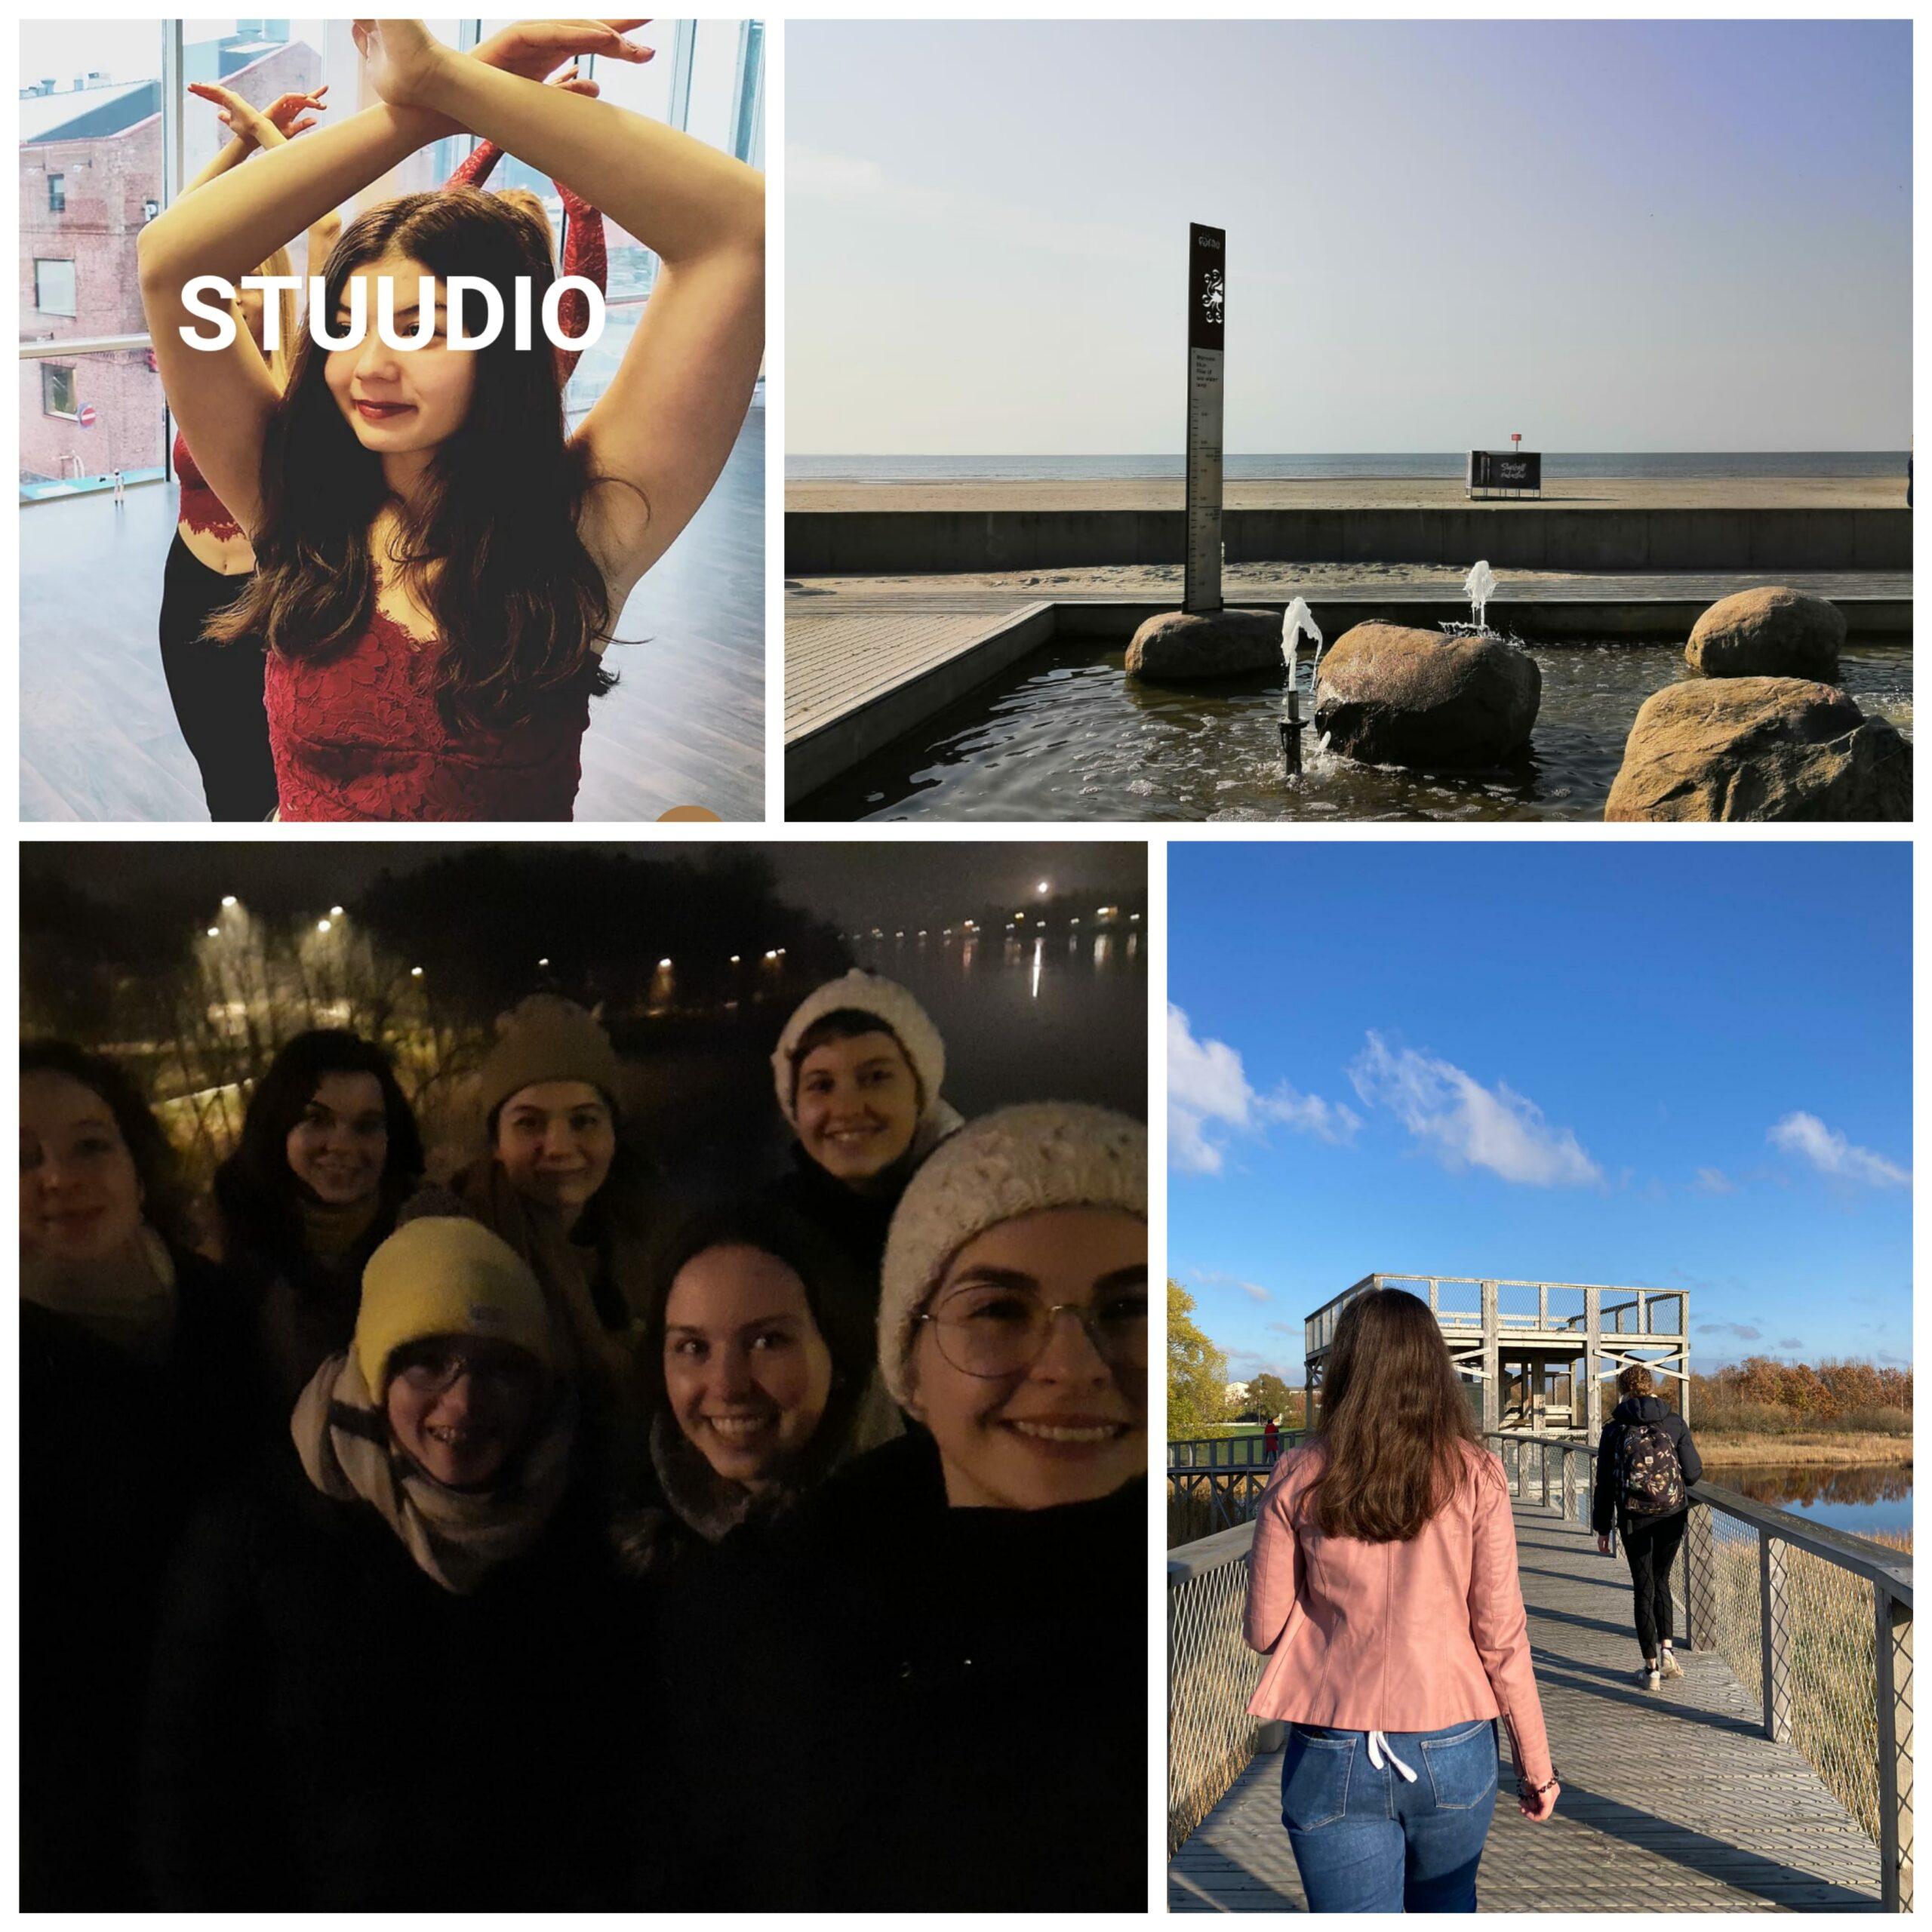 Pärnu Starter Kit: How to survive in Pärnu